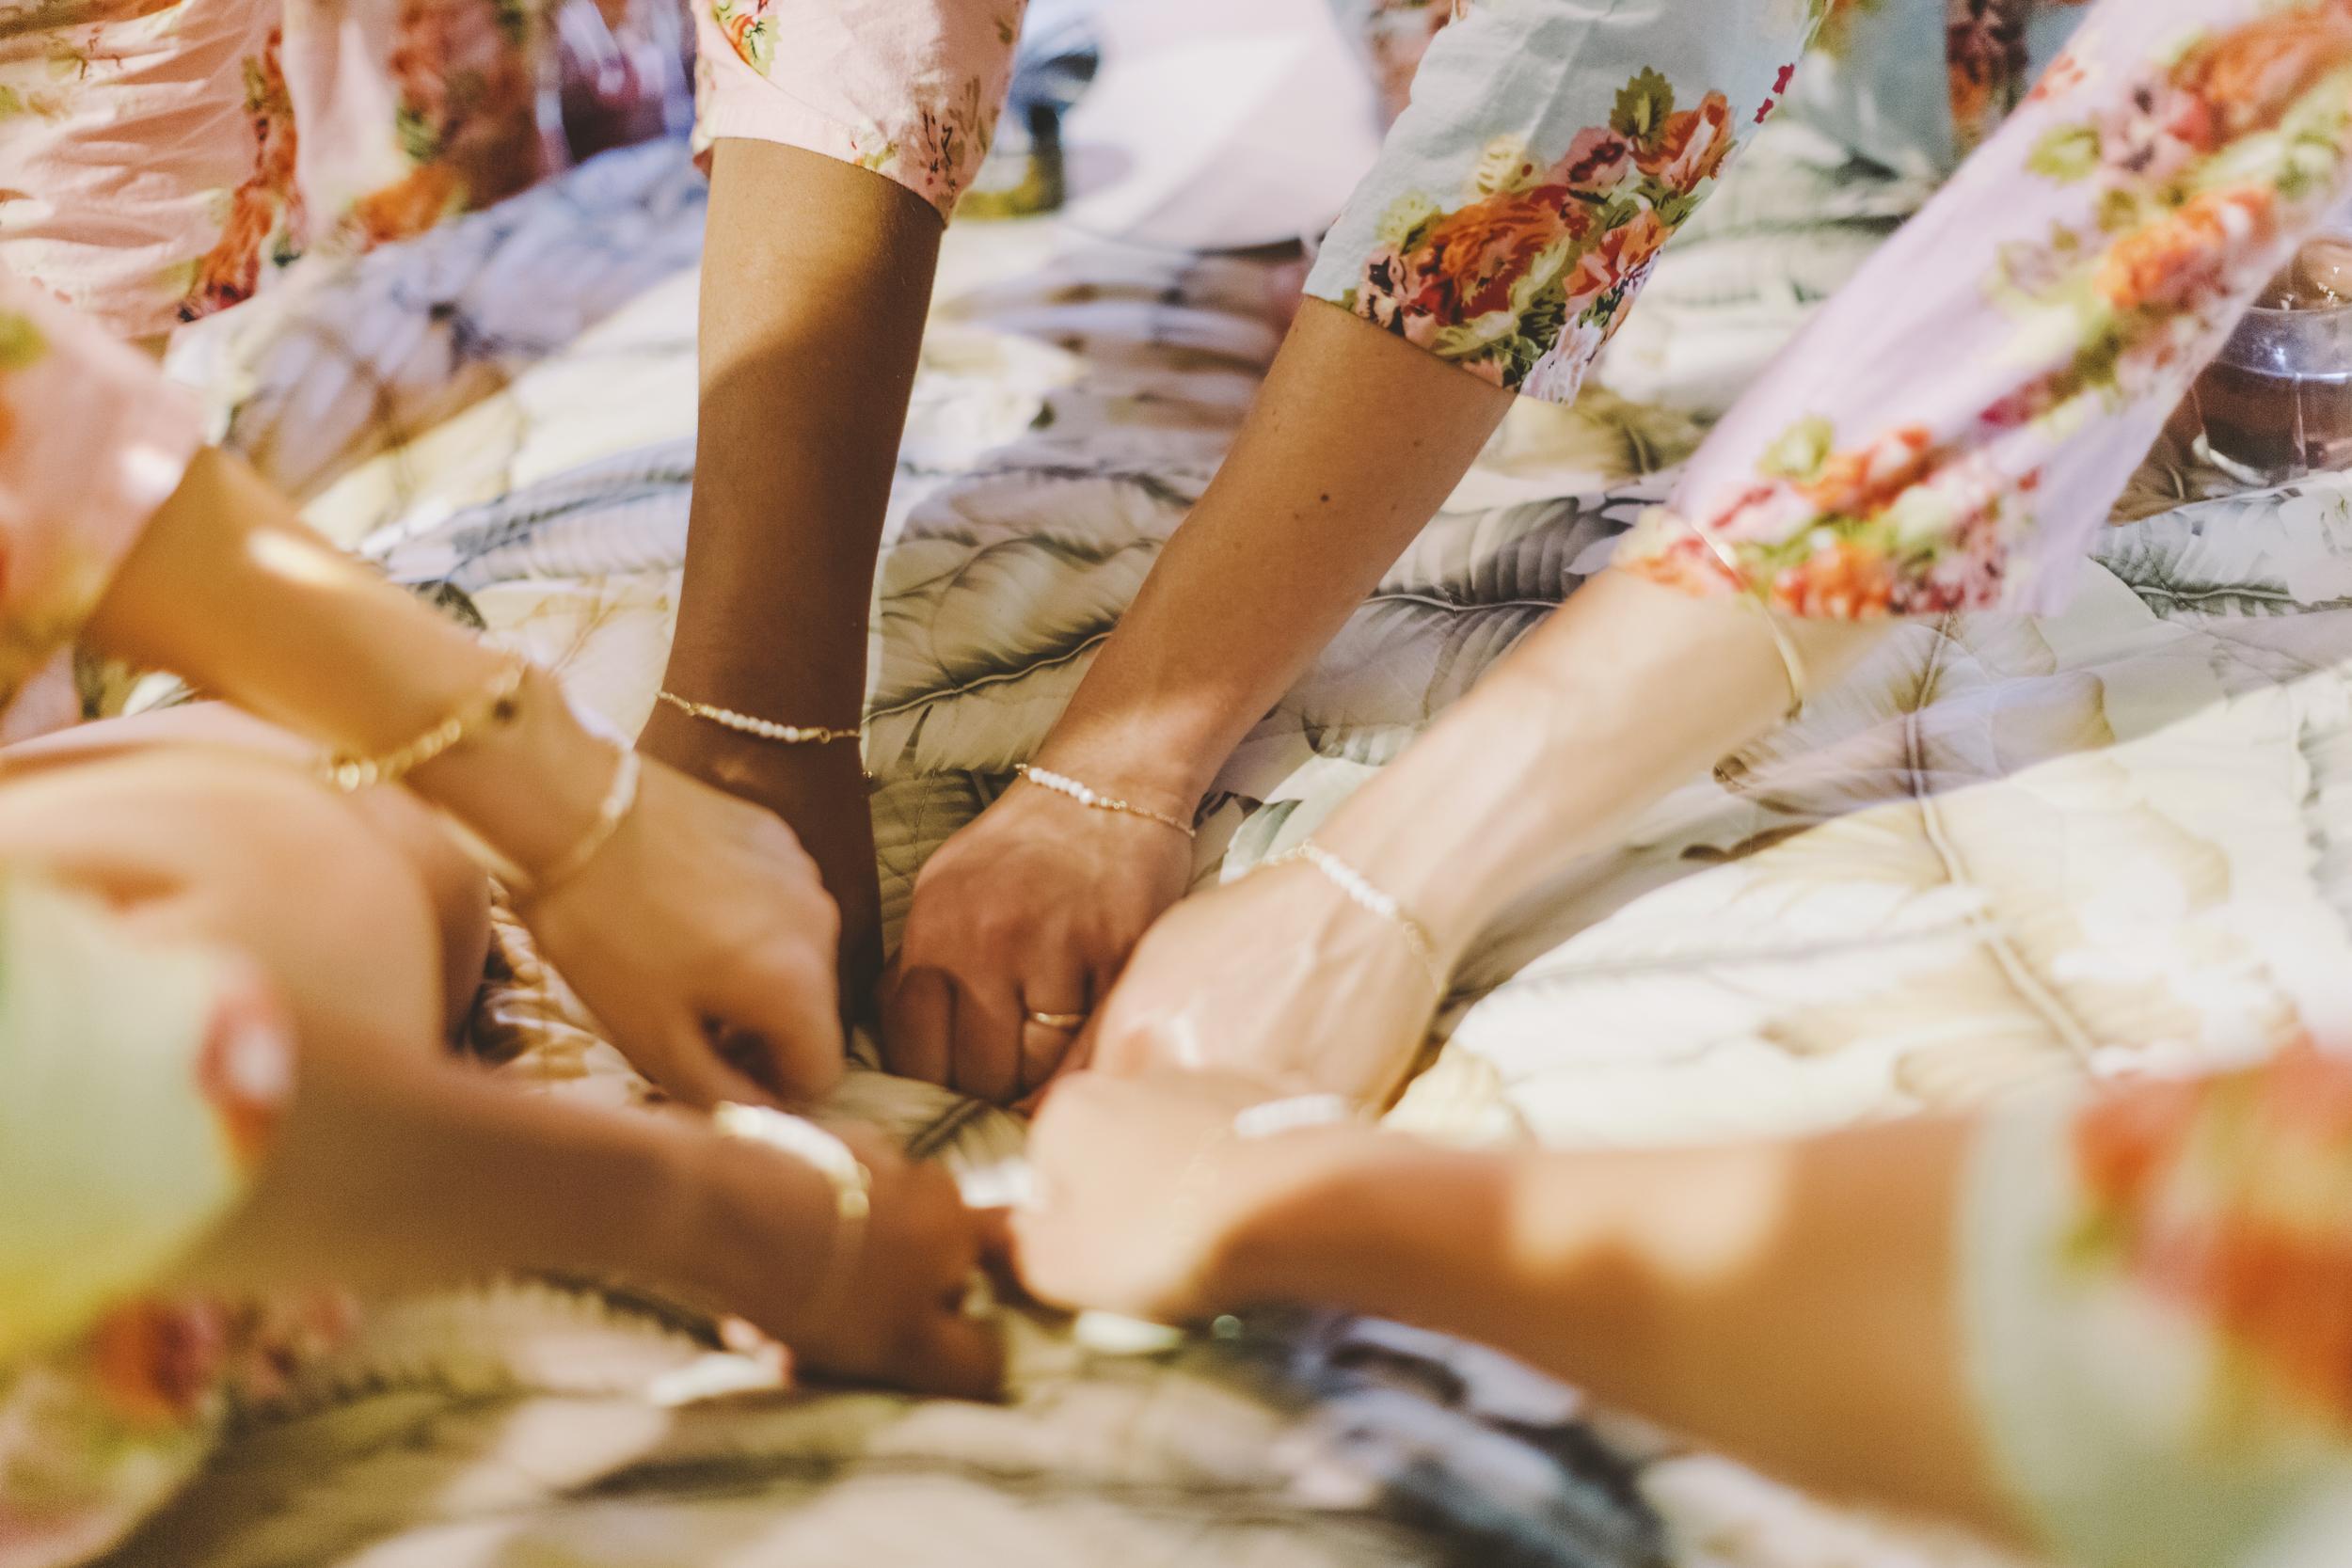 angie-diaz-photography-oahu-hawaii-wedding-tradewinds-ranch-17.jpg